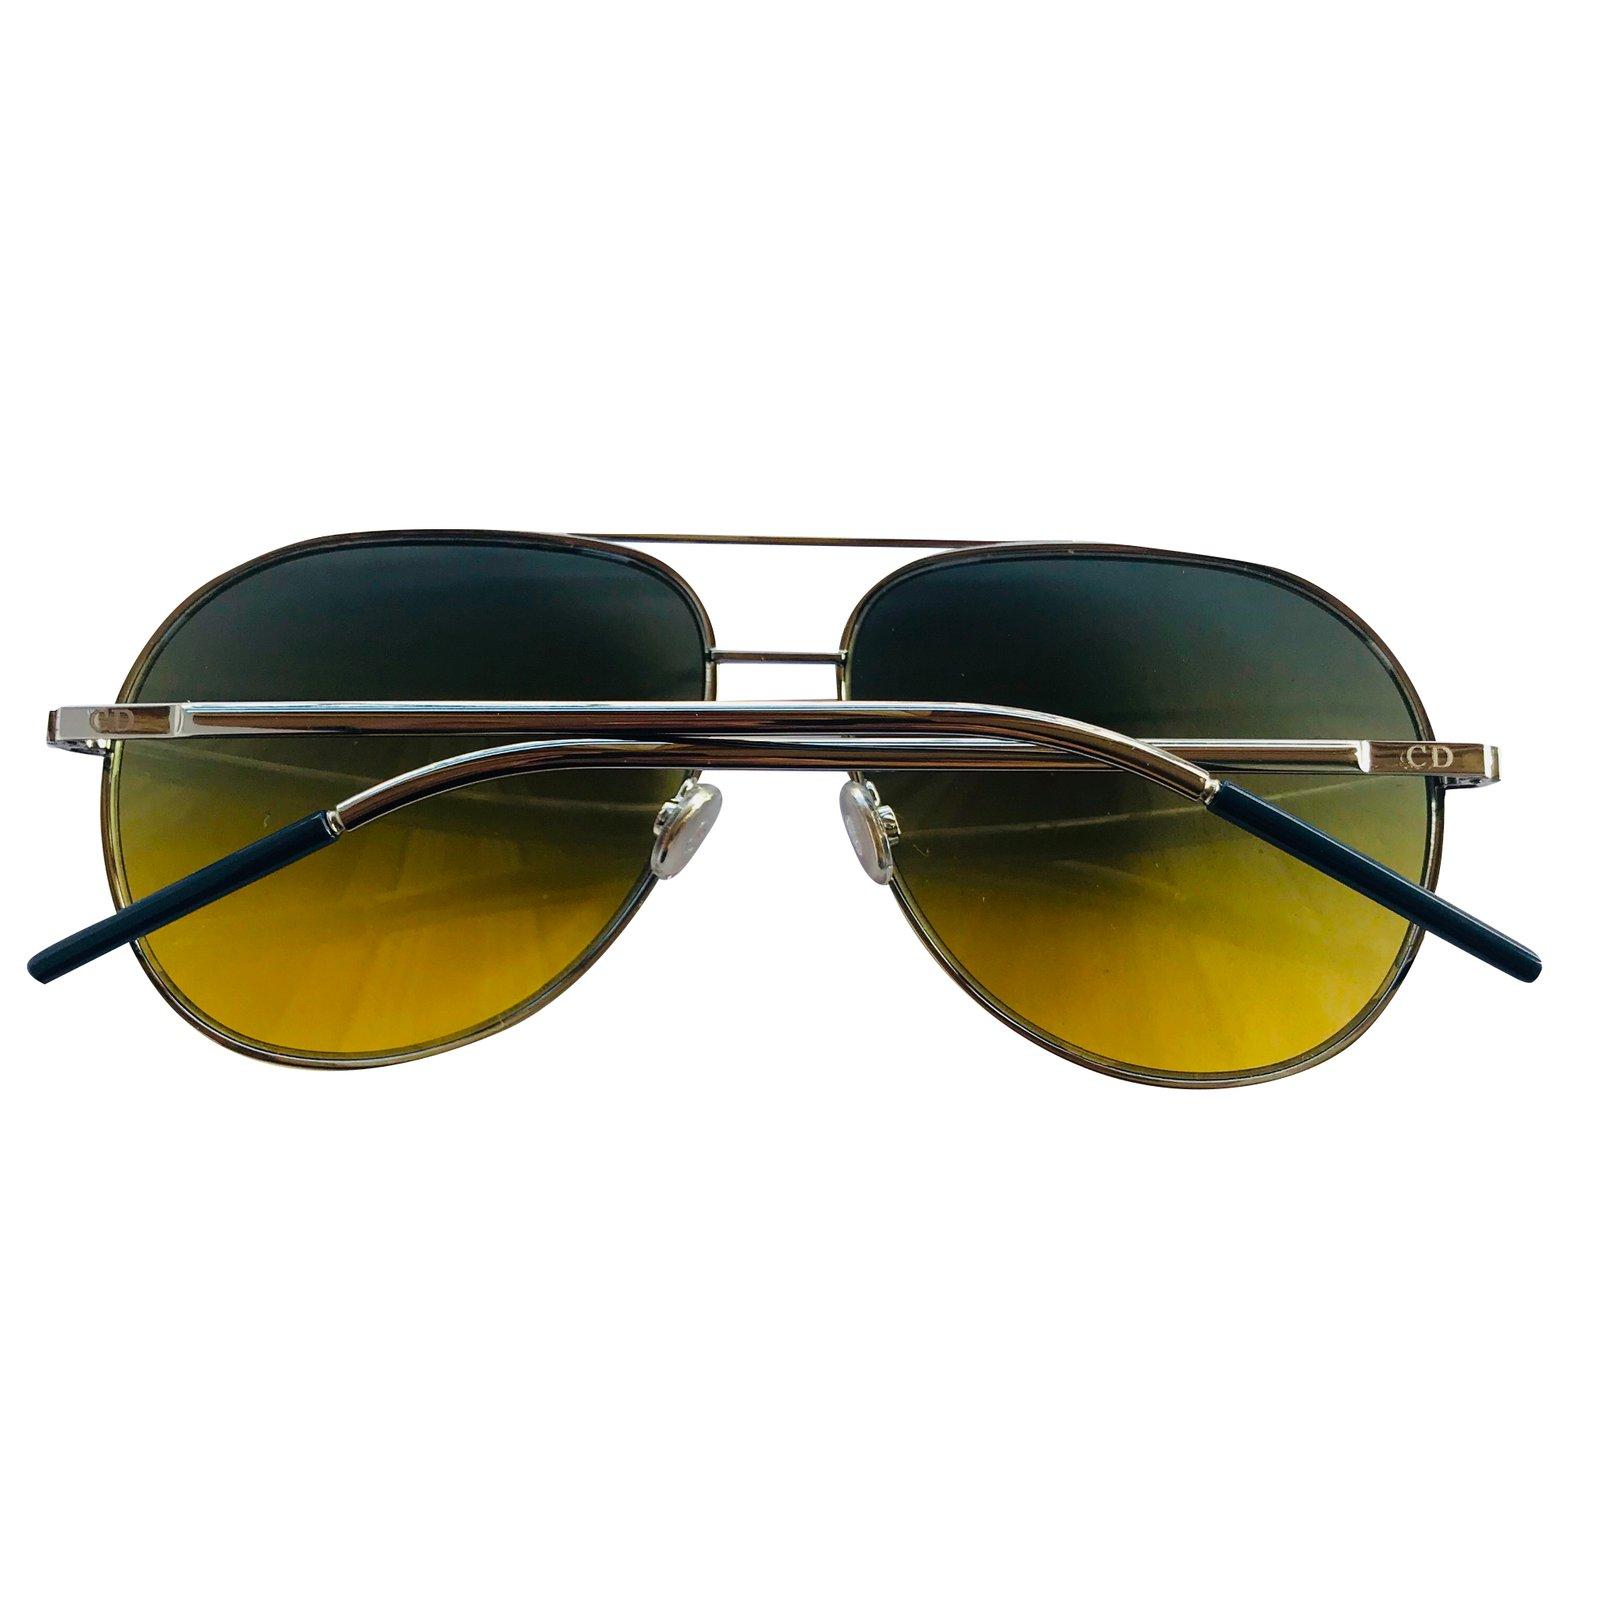 ff9dde4d0bb Christian Dior Dior sunglasses men Sunglasses Metal Silvery ref.48780 -  Joli Closet